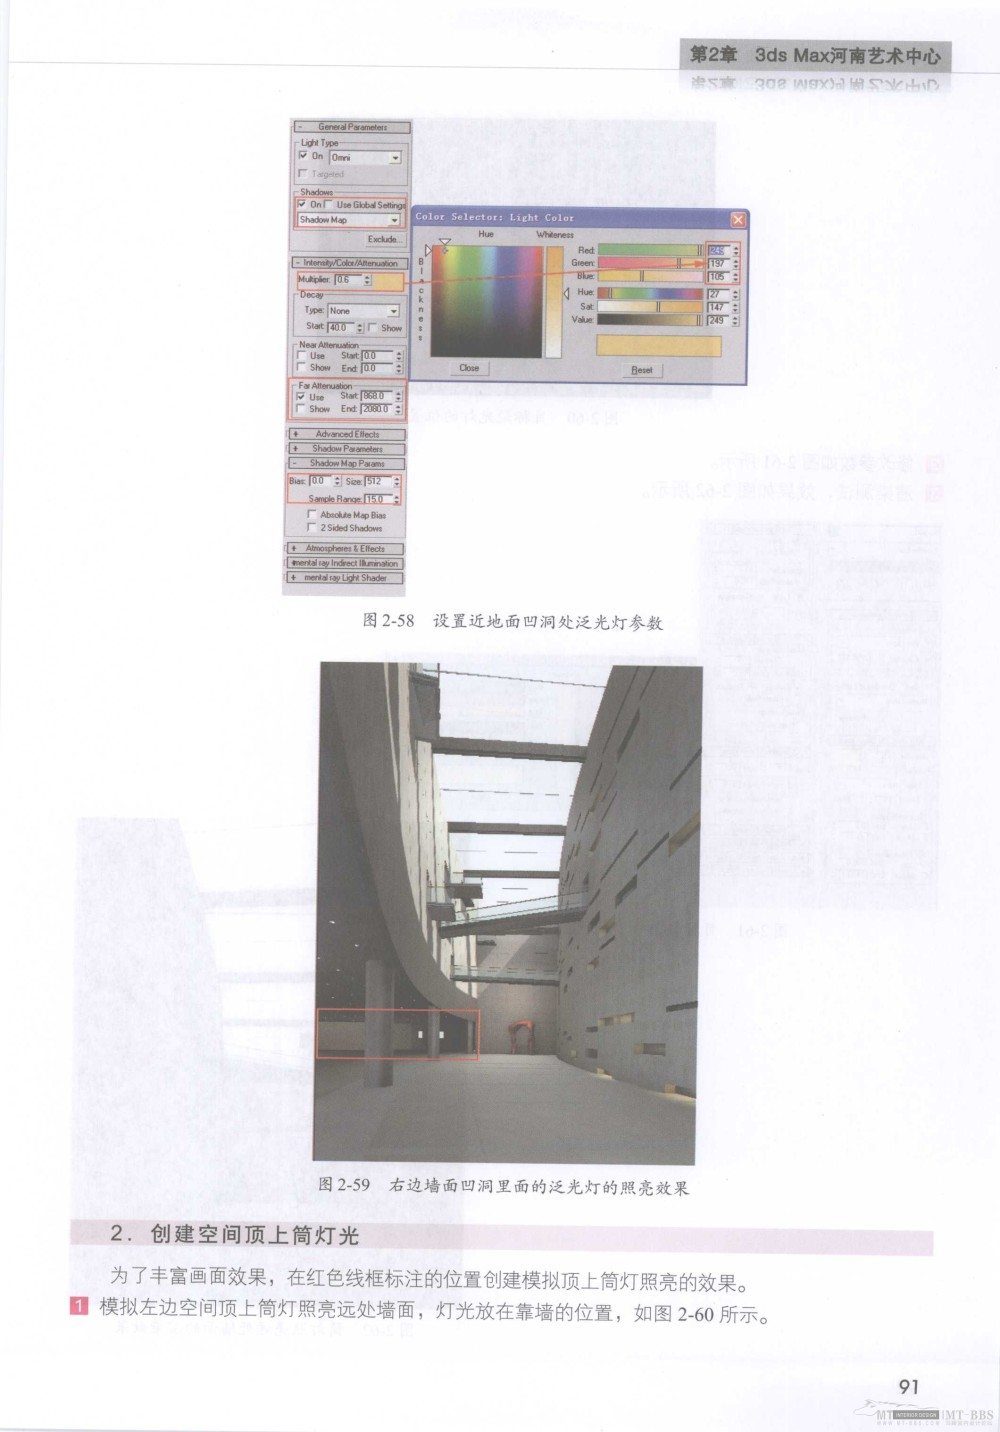 水晶石技法-3ds_Max&VRay室内空间表现_水晶石技法-3ds_Max&VRay室内空间表现_页面_097.jpg